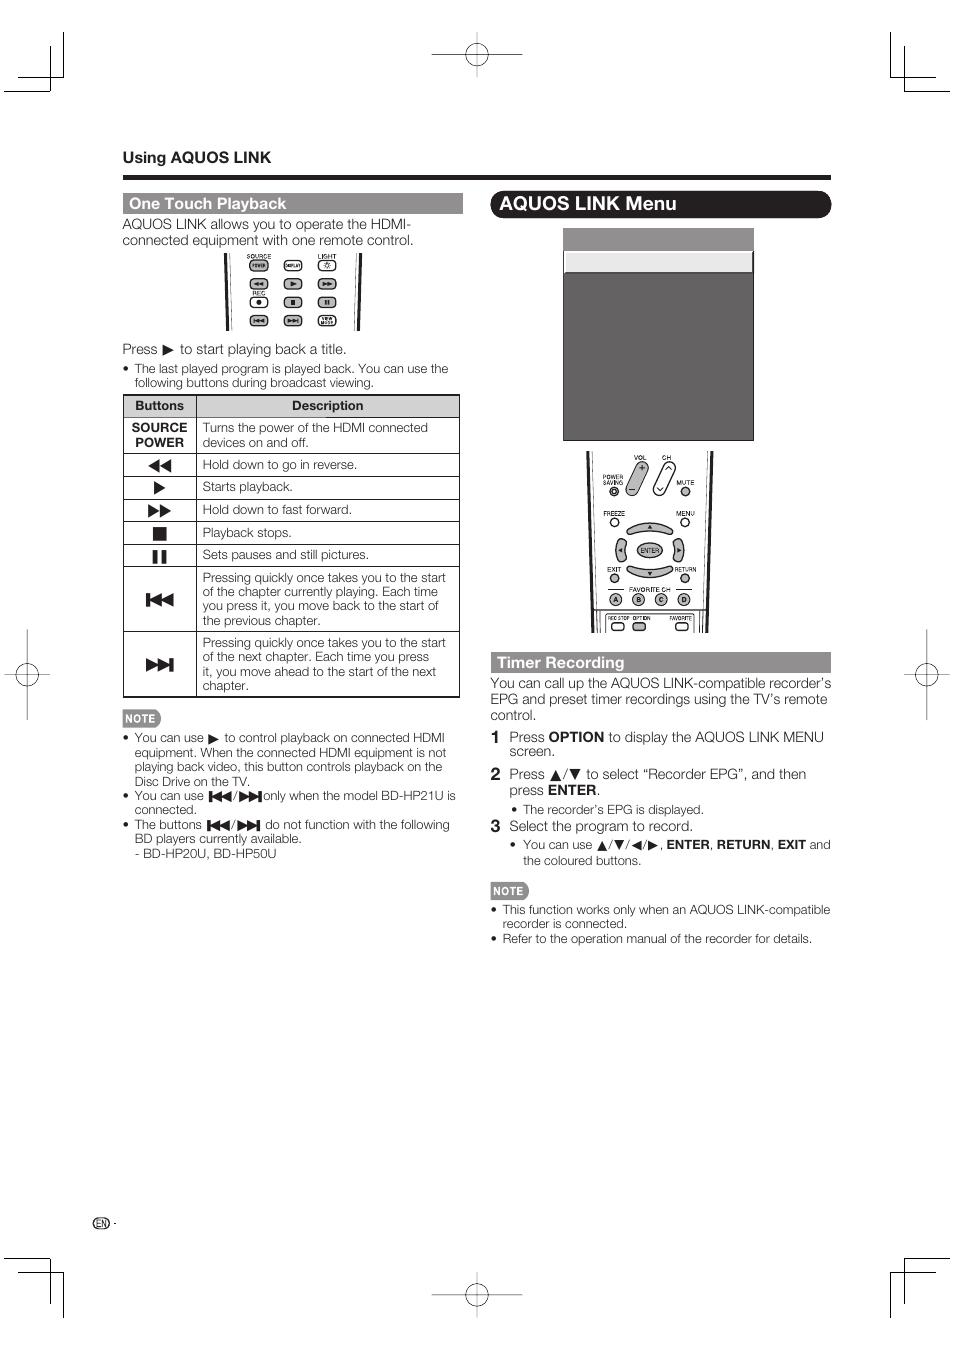 aquos link menu sharp aquos lc 46bd80un user manual page 54 65 rh manualsdir com sharp aquos 65 smart tv manual sharp aquos 65 4k manual